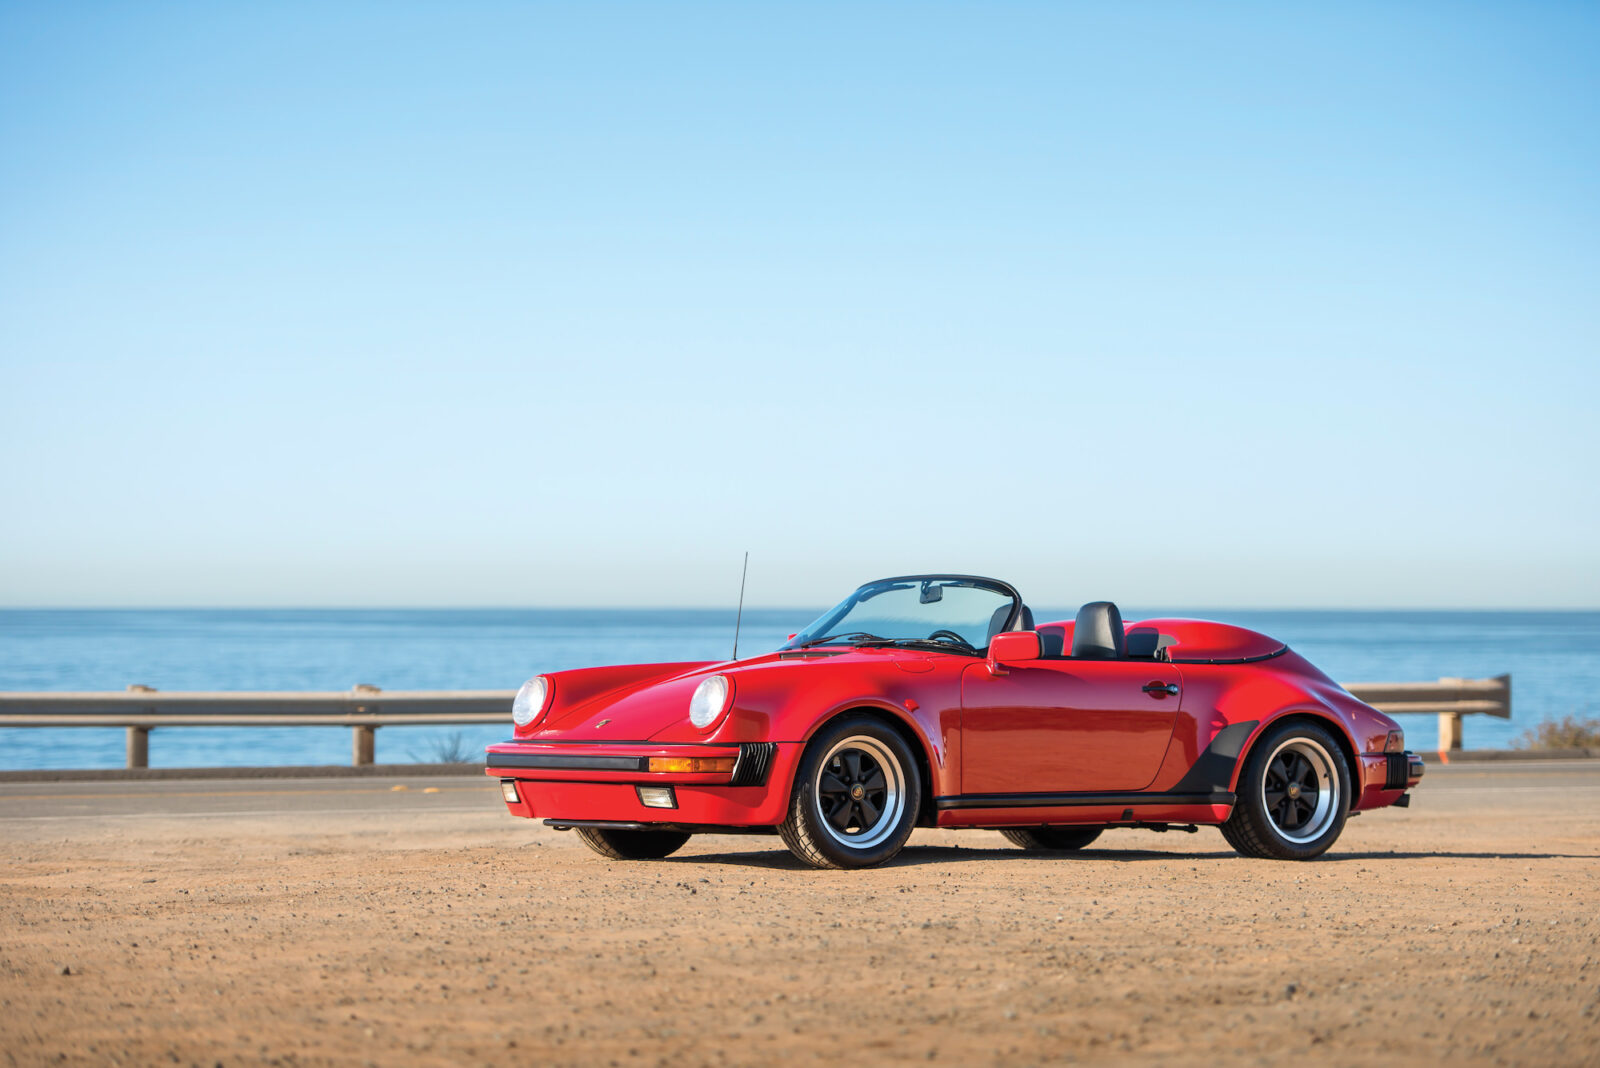 Porsche 911 Speedster1 1600x1068 - Porsche 911 Speedster